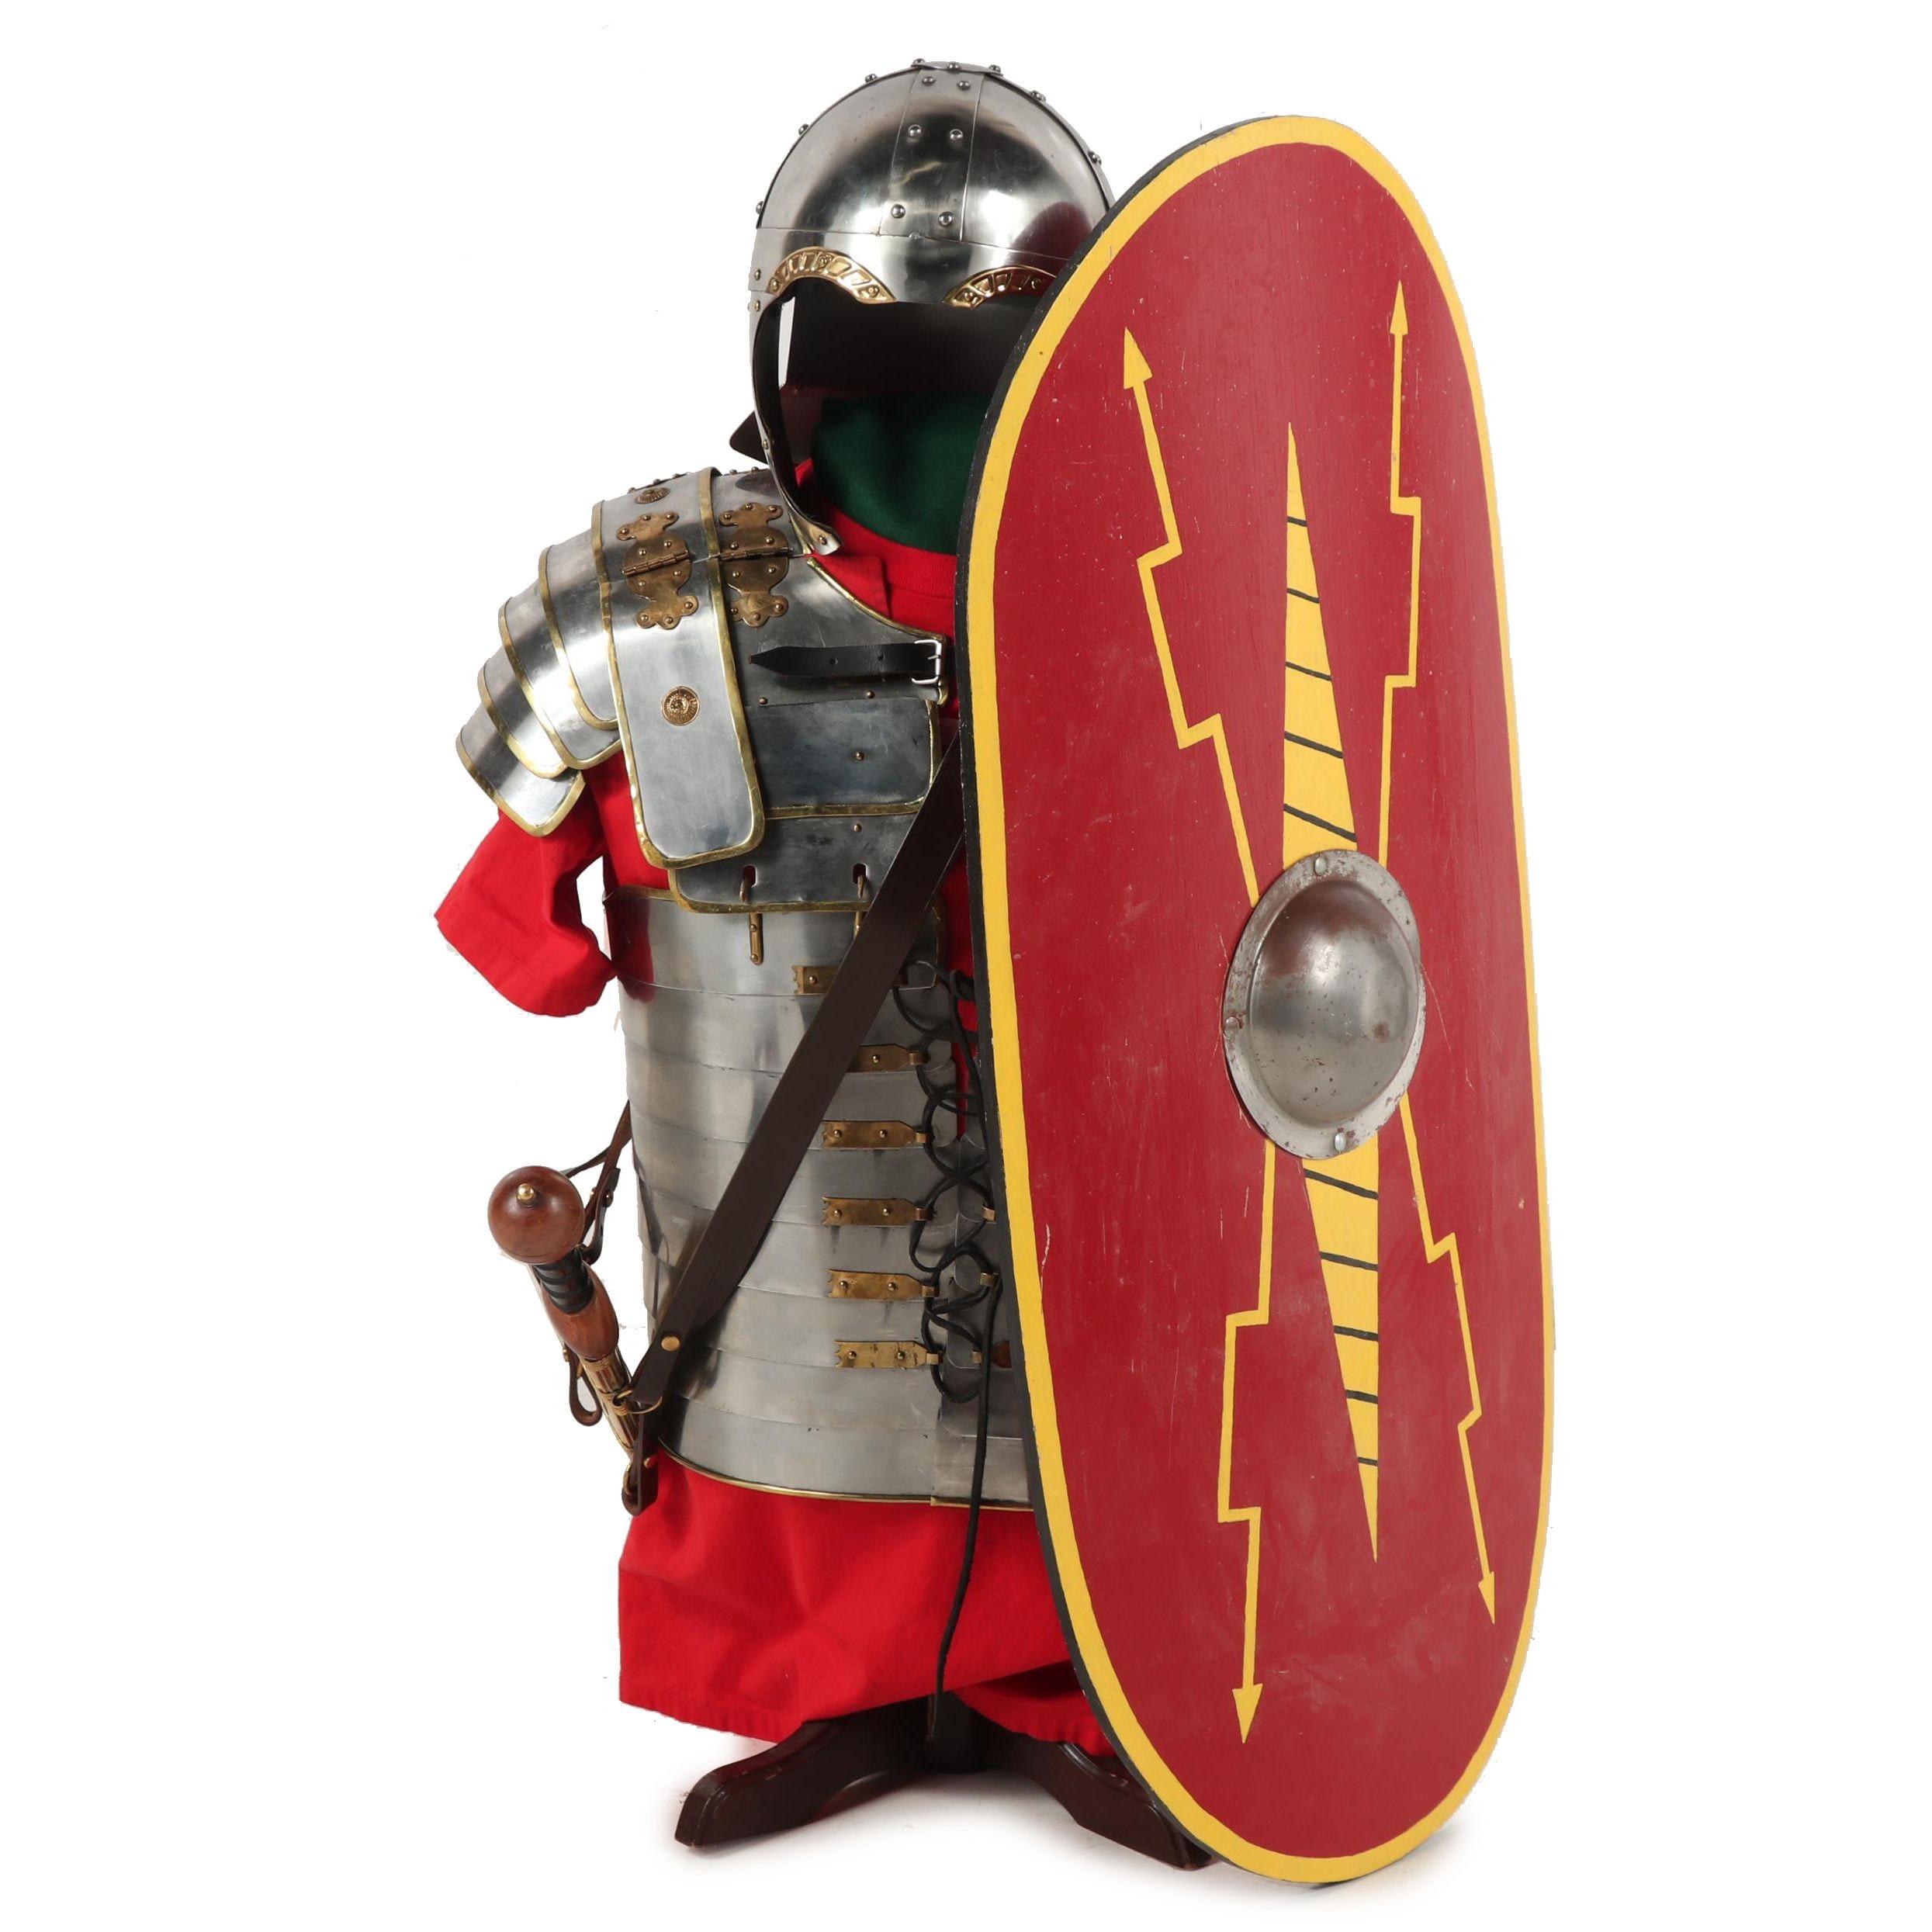 Replica Imperial Roman Army Legionary Costume Armor, Gladius and Shield